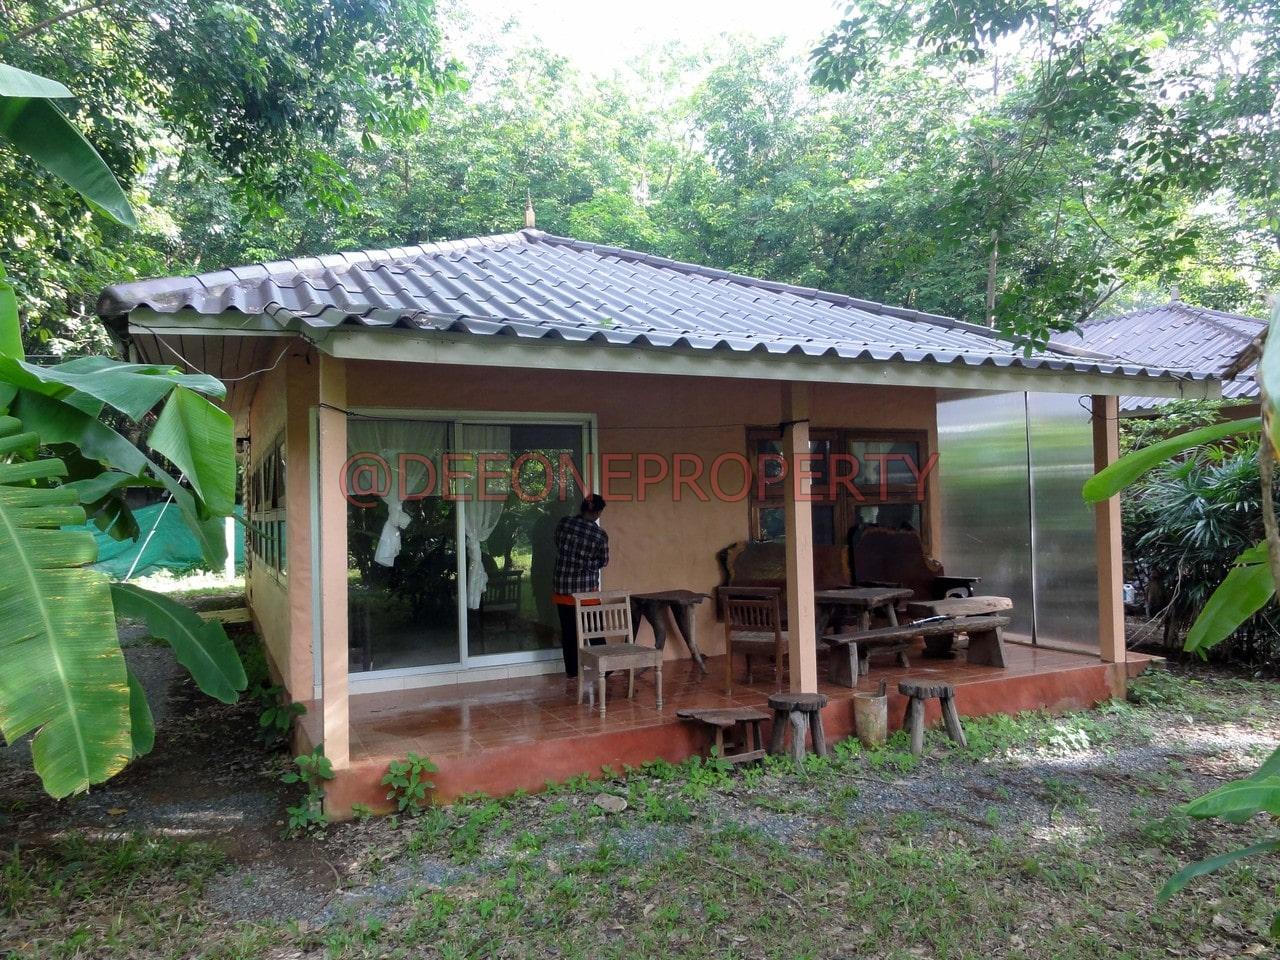 Maison avec 2 chambres louer klong prao koh chang - Maison 2 chambres a louer ...